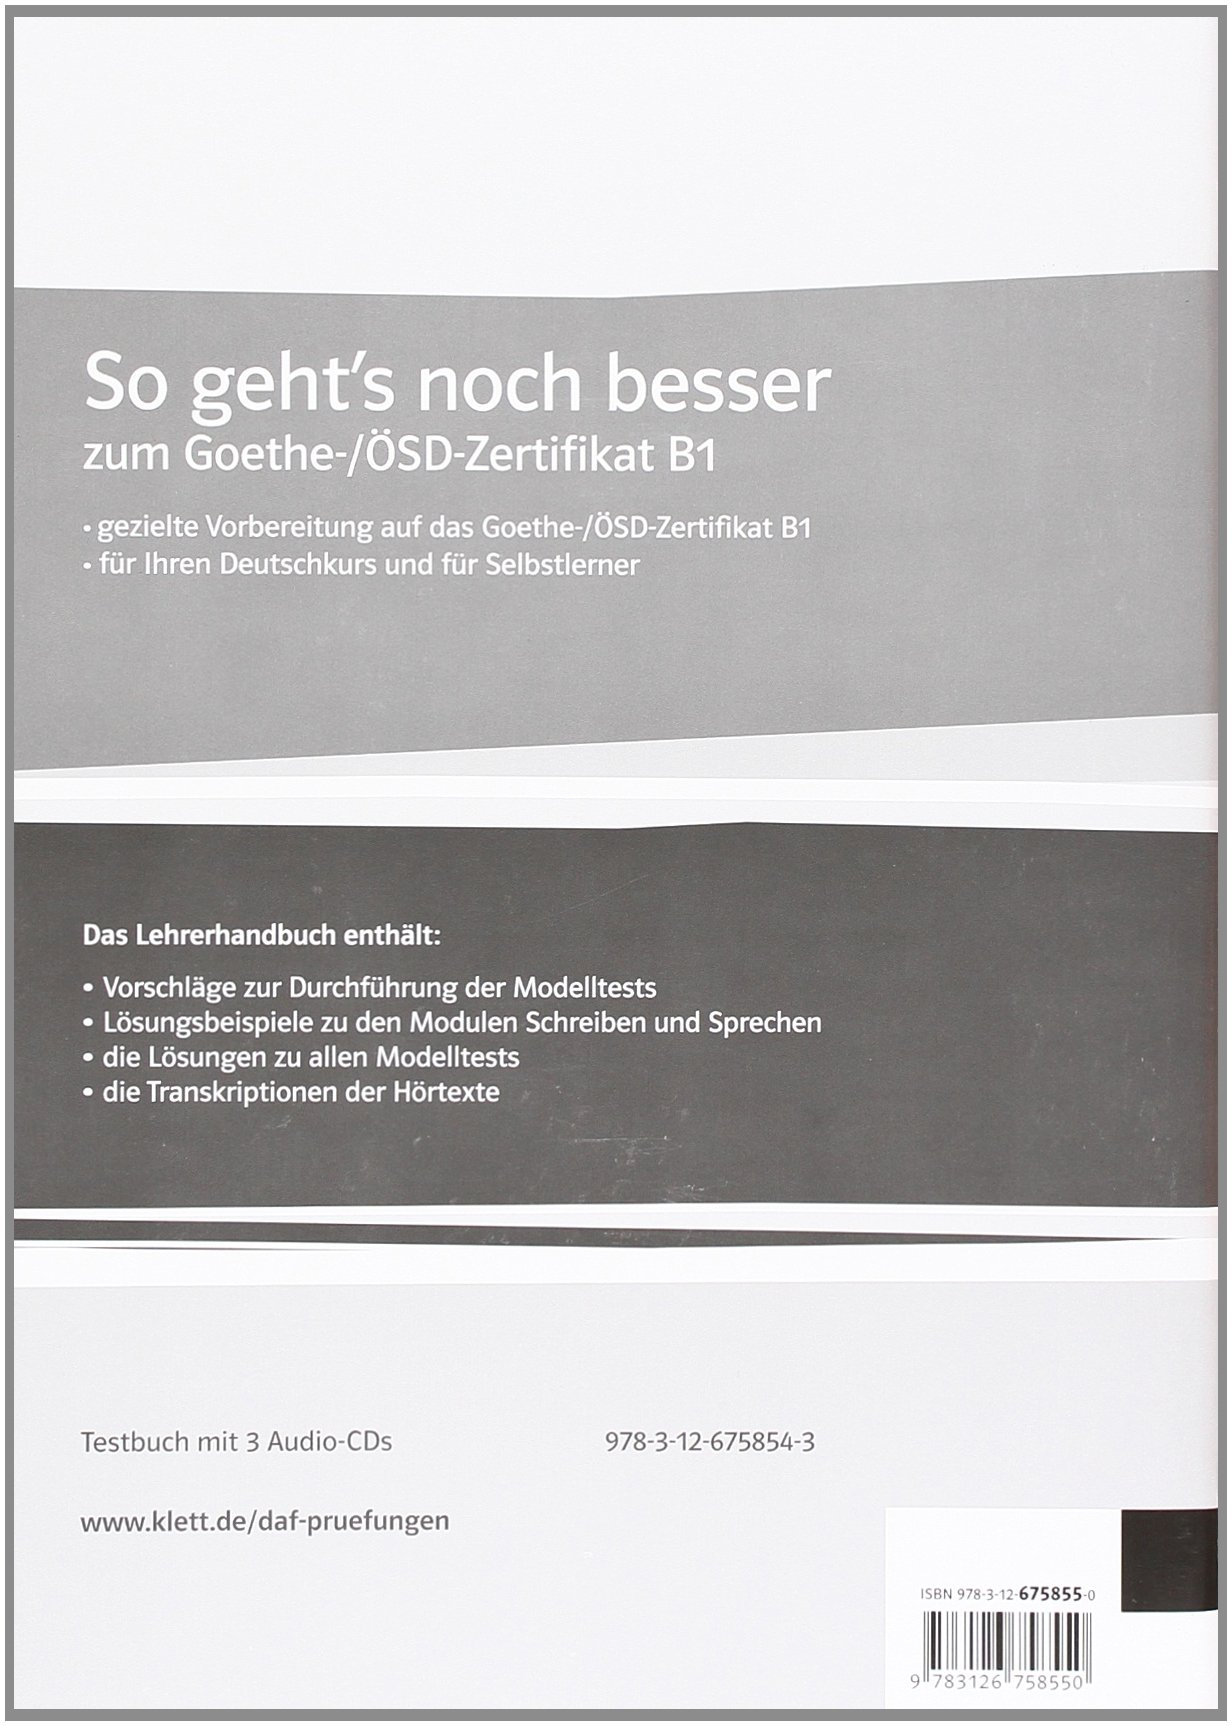 Buy So Gehts Noch Besser Zum Goethe Osd Zertifikat B1